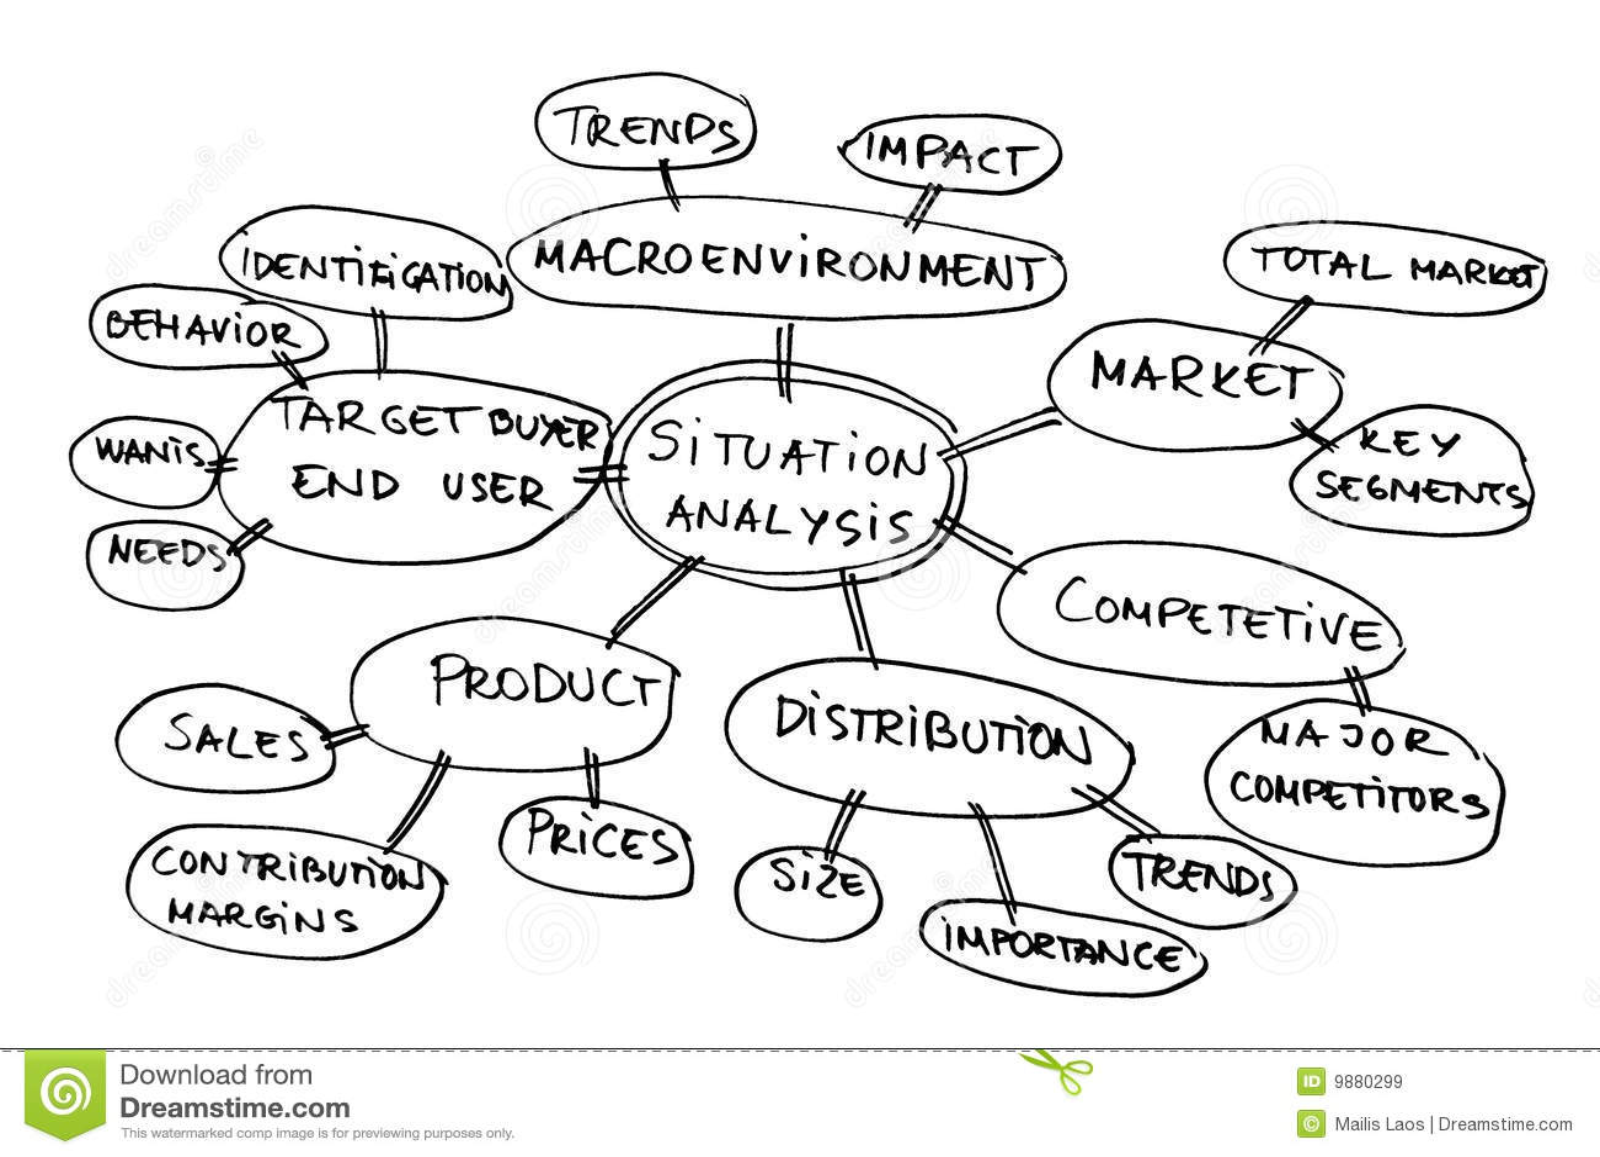 Situation analysis diagram stock illustration. Image of